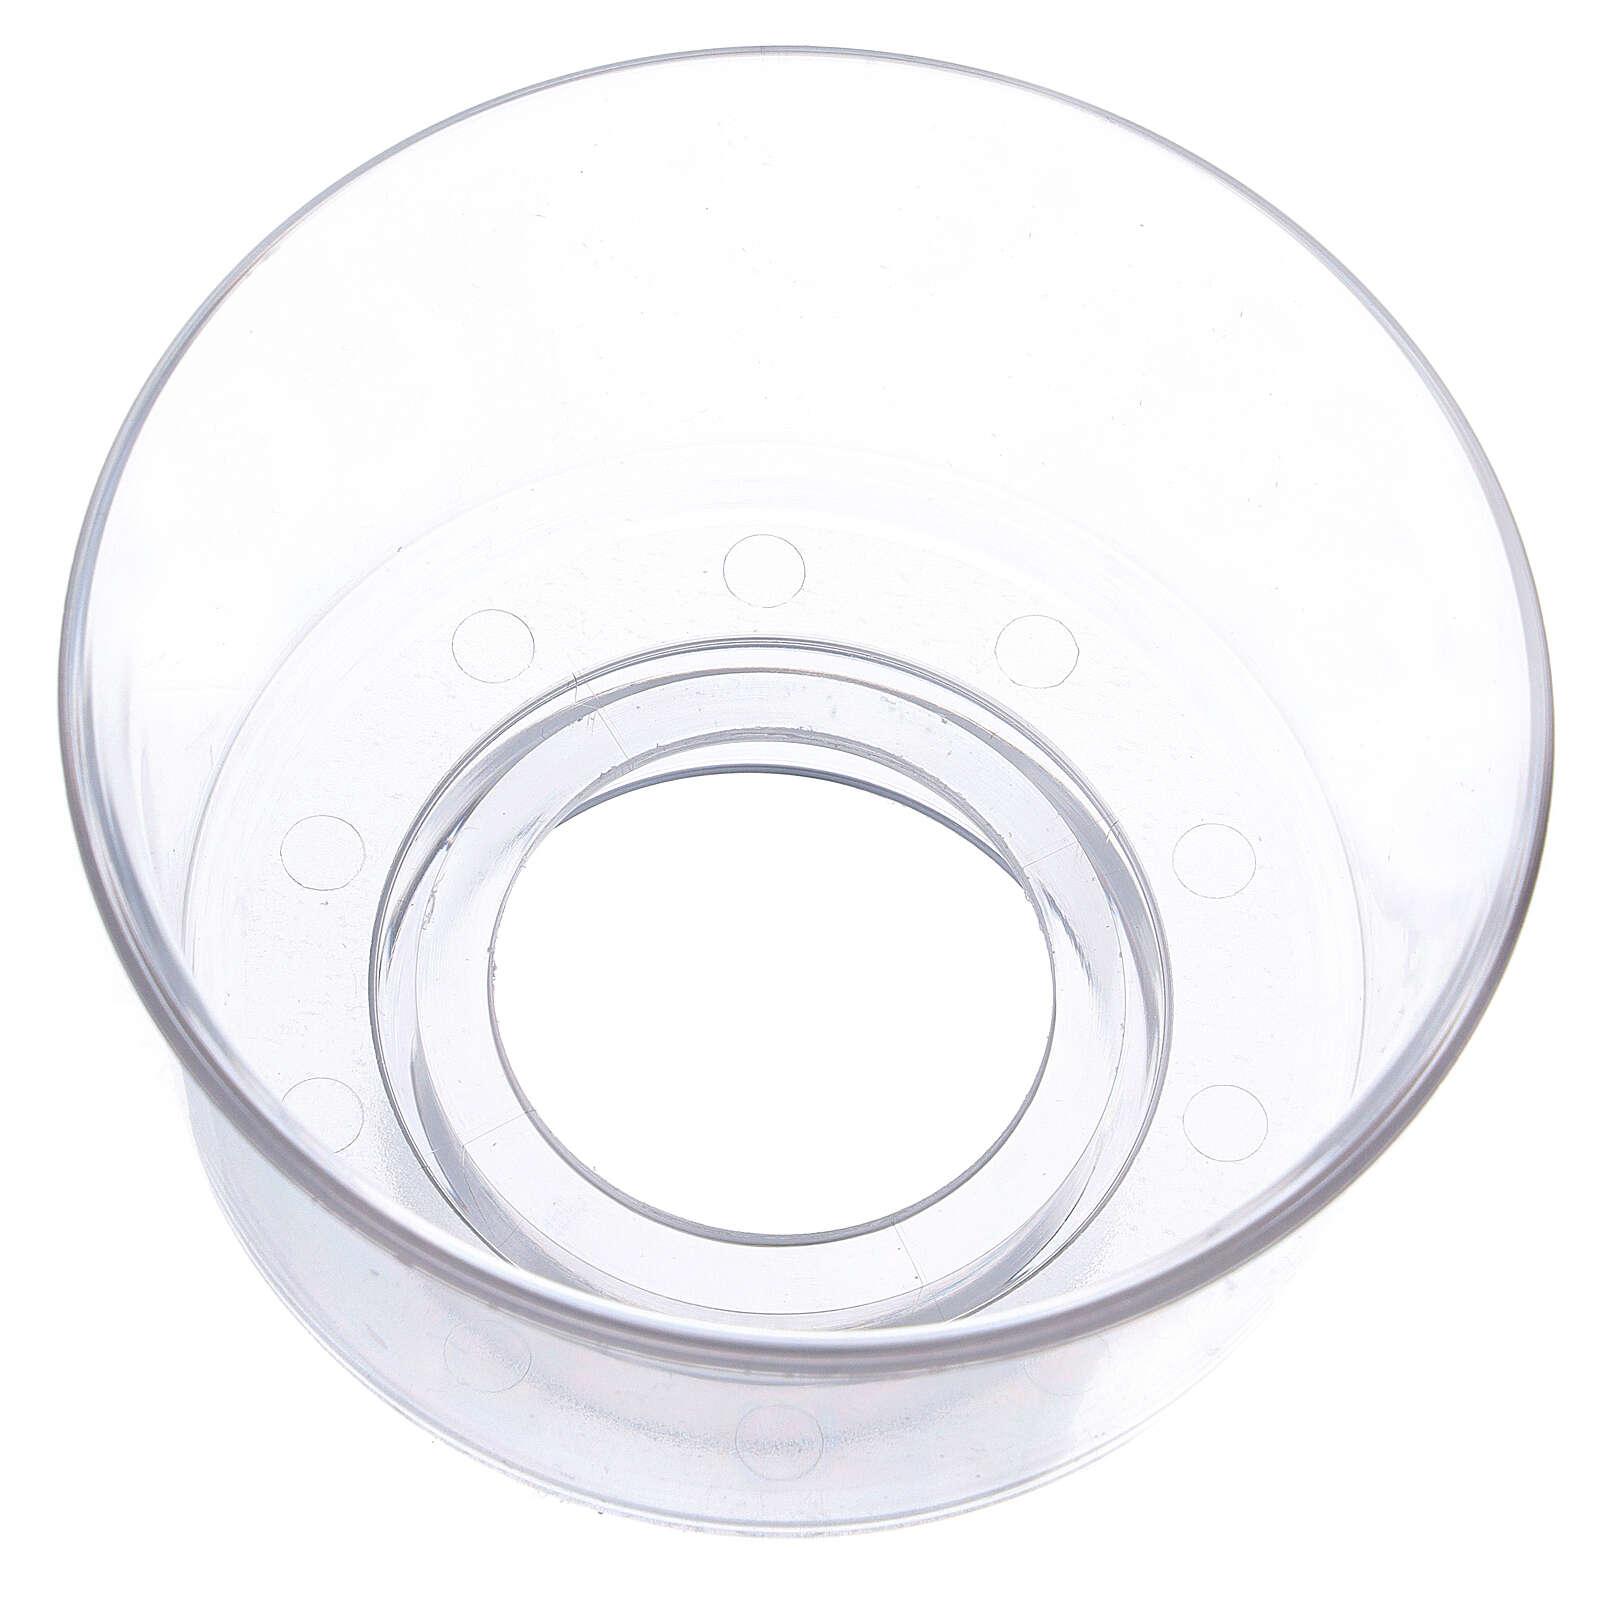 Paravento in vetro diametro 5 cm 3